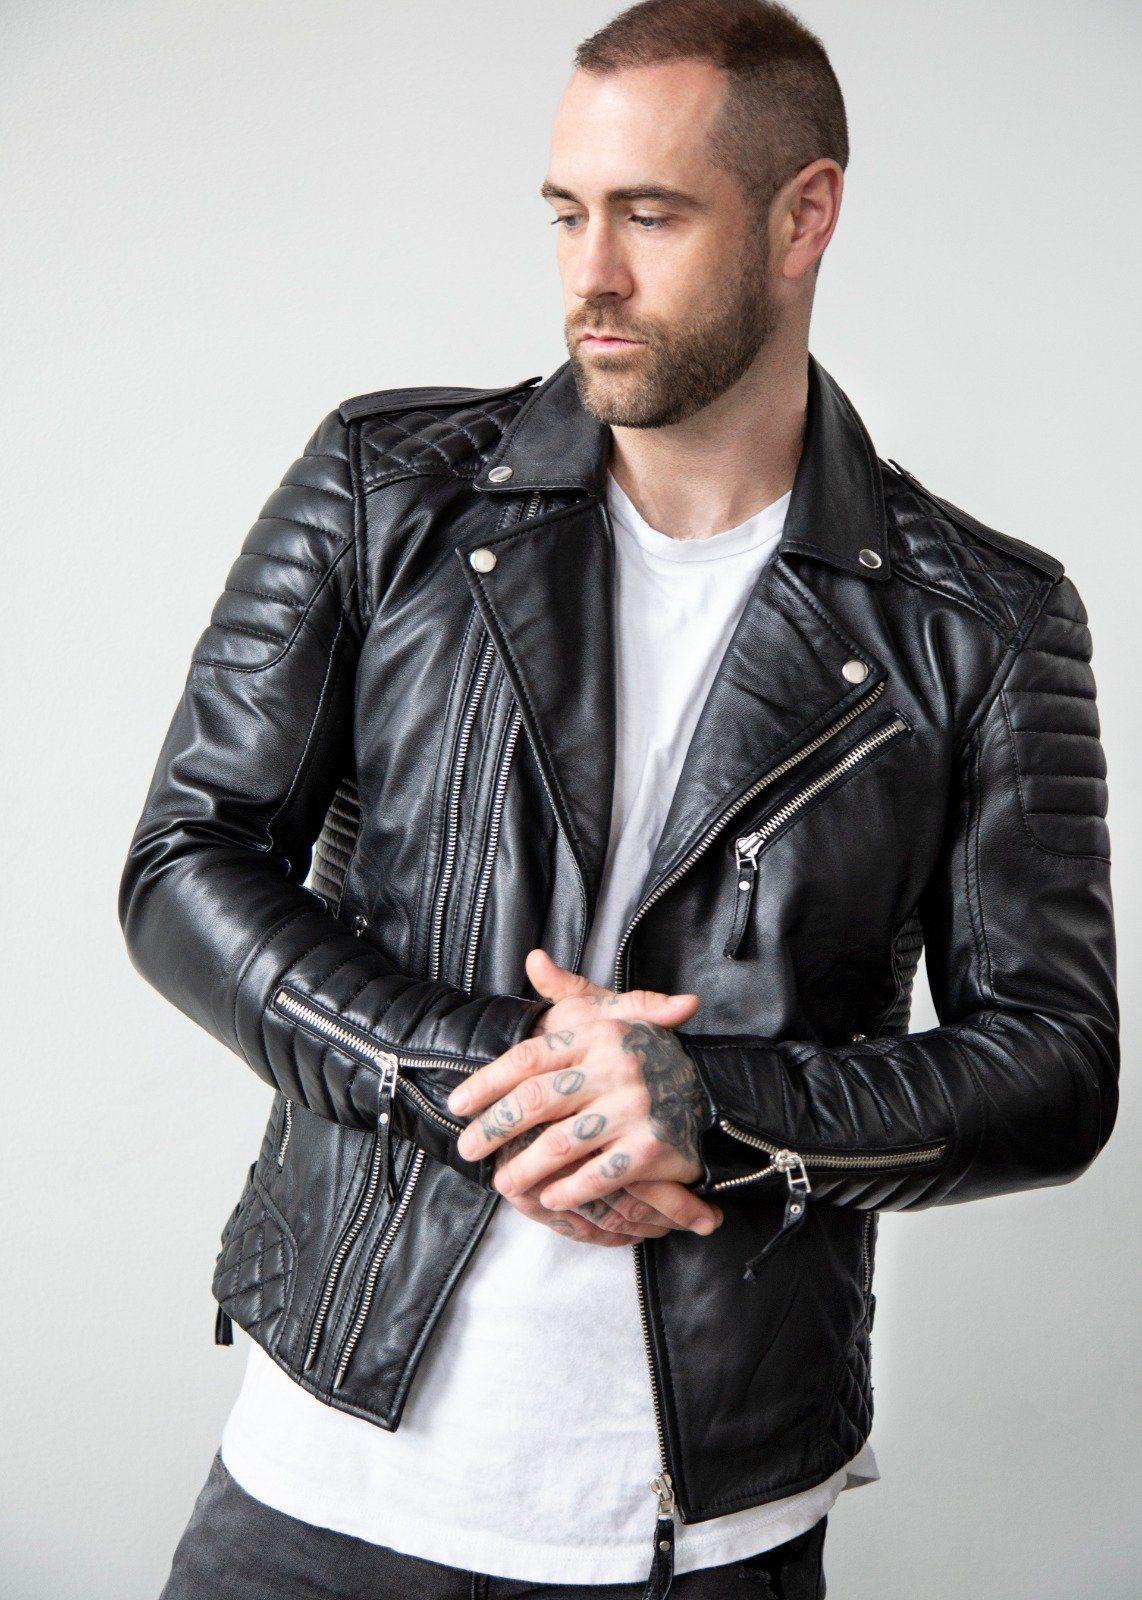 Mens Quilted Black Leather Motorcycle Jacket Black Leather Motorcycle Jacket Black Leather Jacket Men Mens Designer Leather Jackets [ 1600 x 1142 Pixel ]